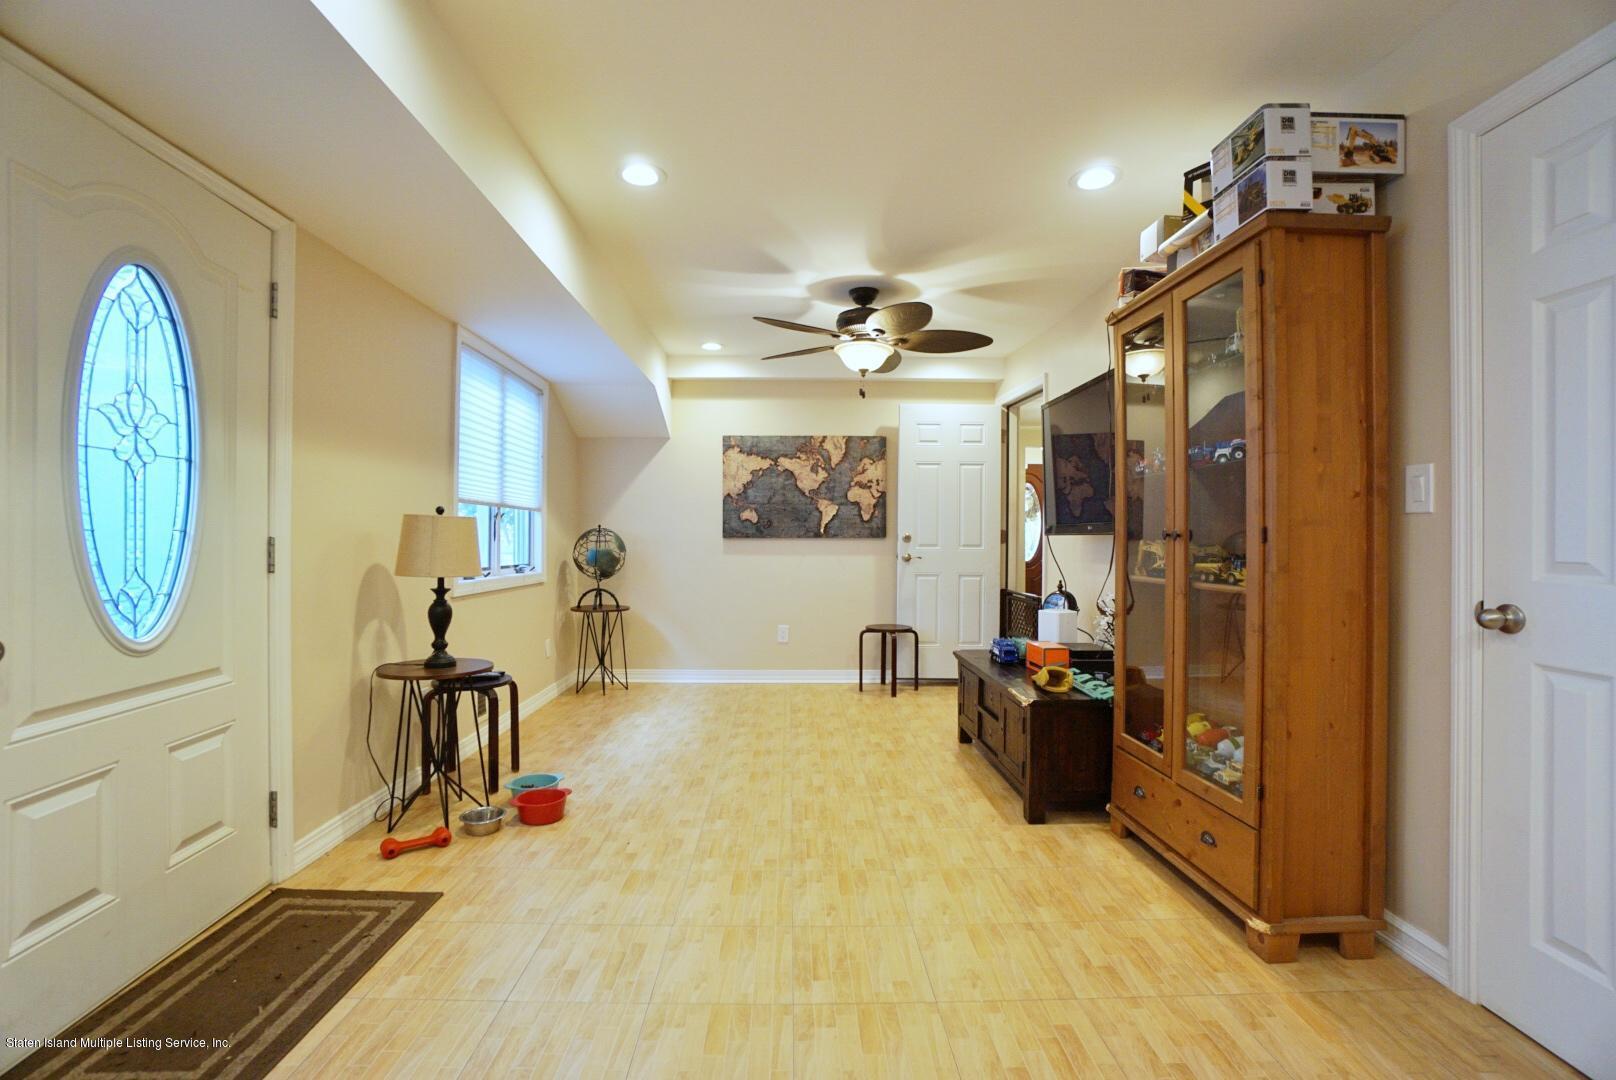 Single Family - Semi-Attached 47 Ilyse Court   Staten Island, NY 10306, MLS-1141335-24